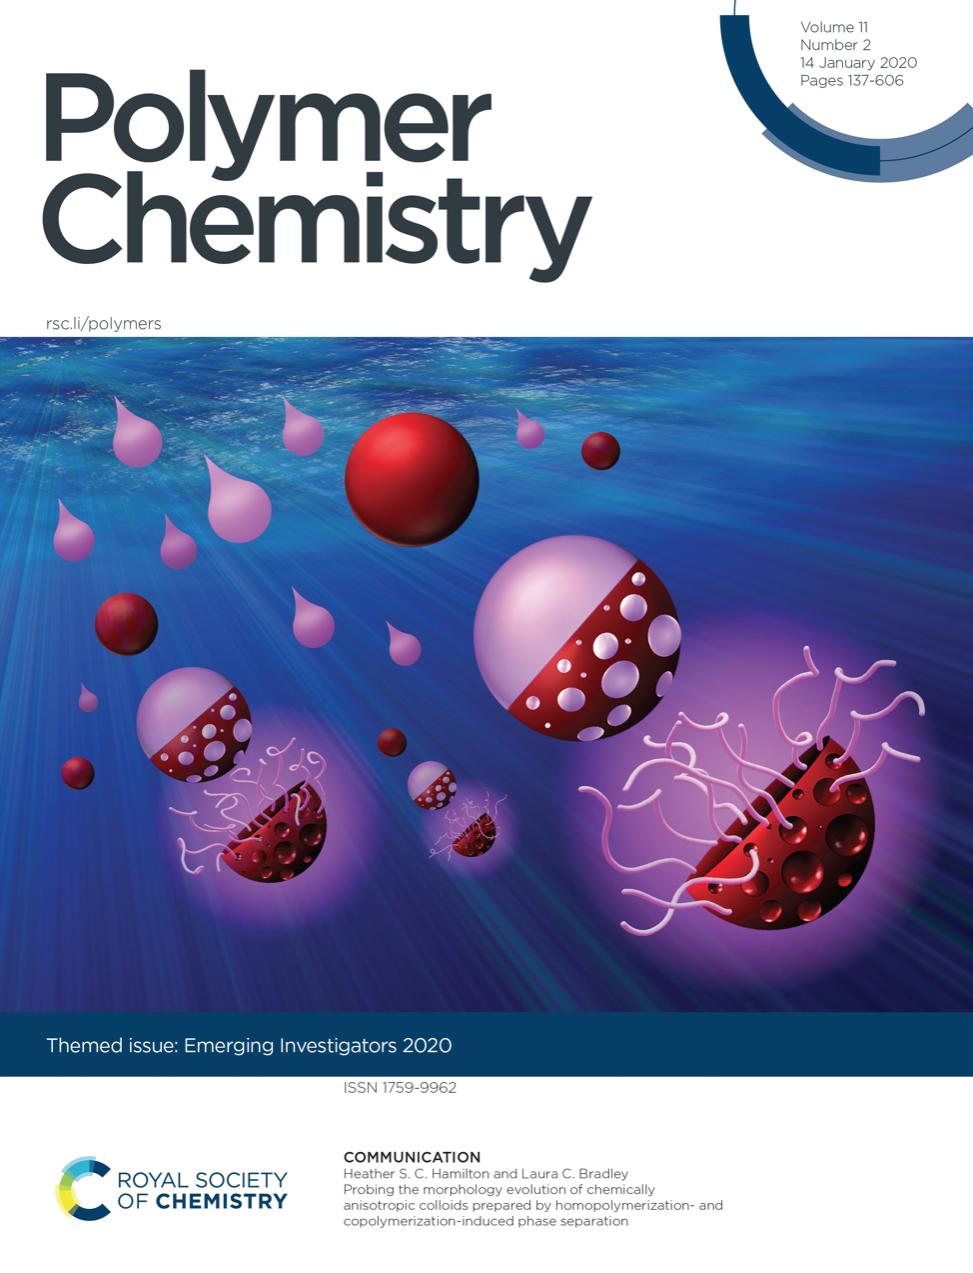 Peter Emerging Investigator Polymer Chemistry 2020